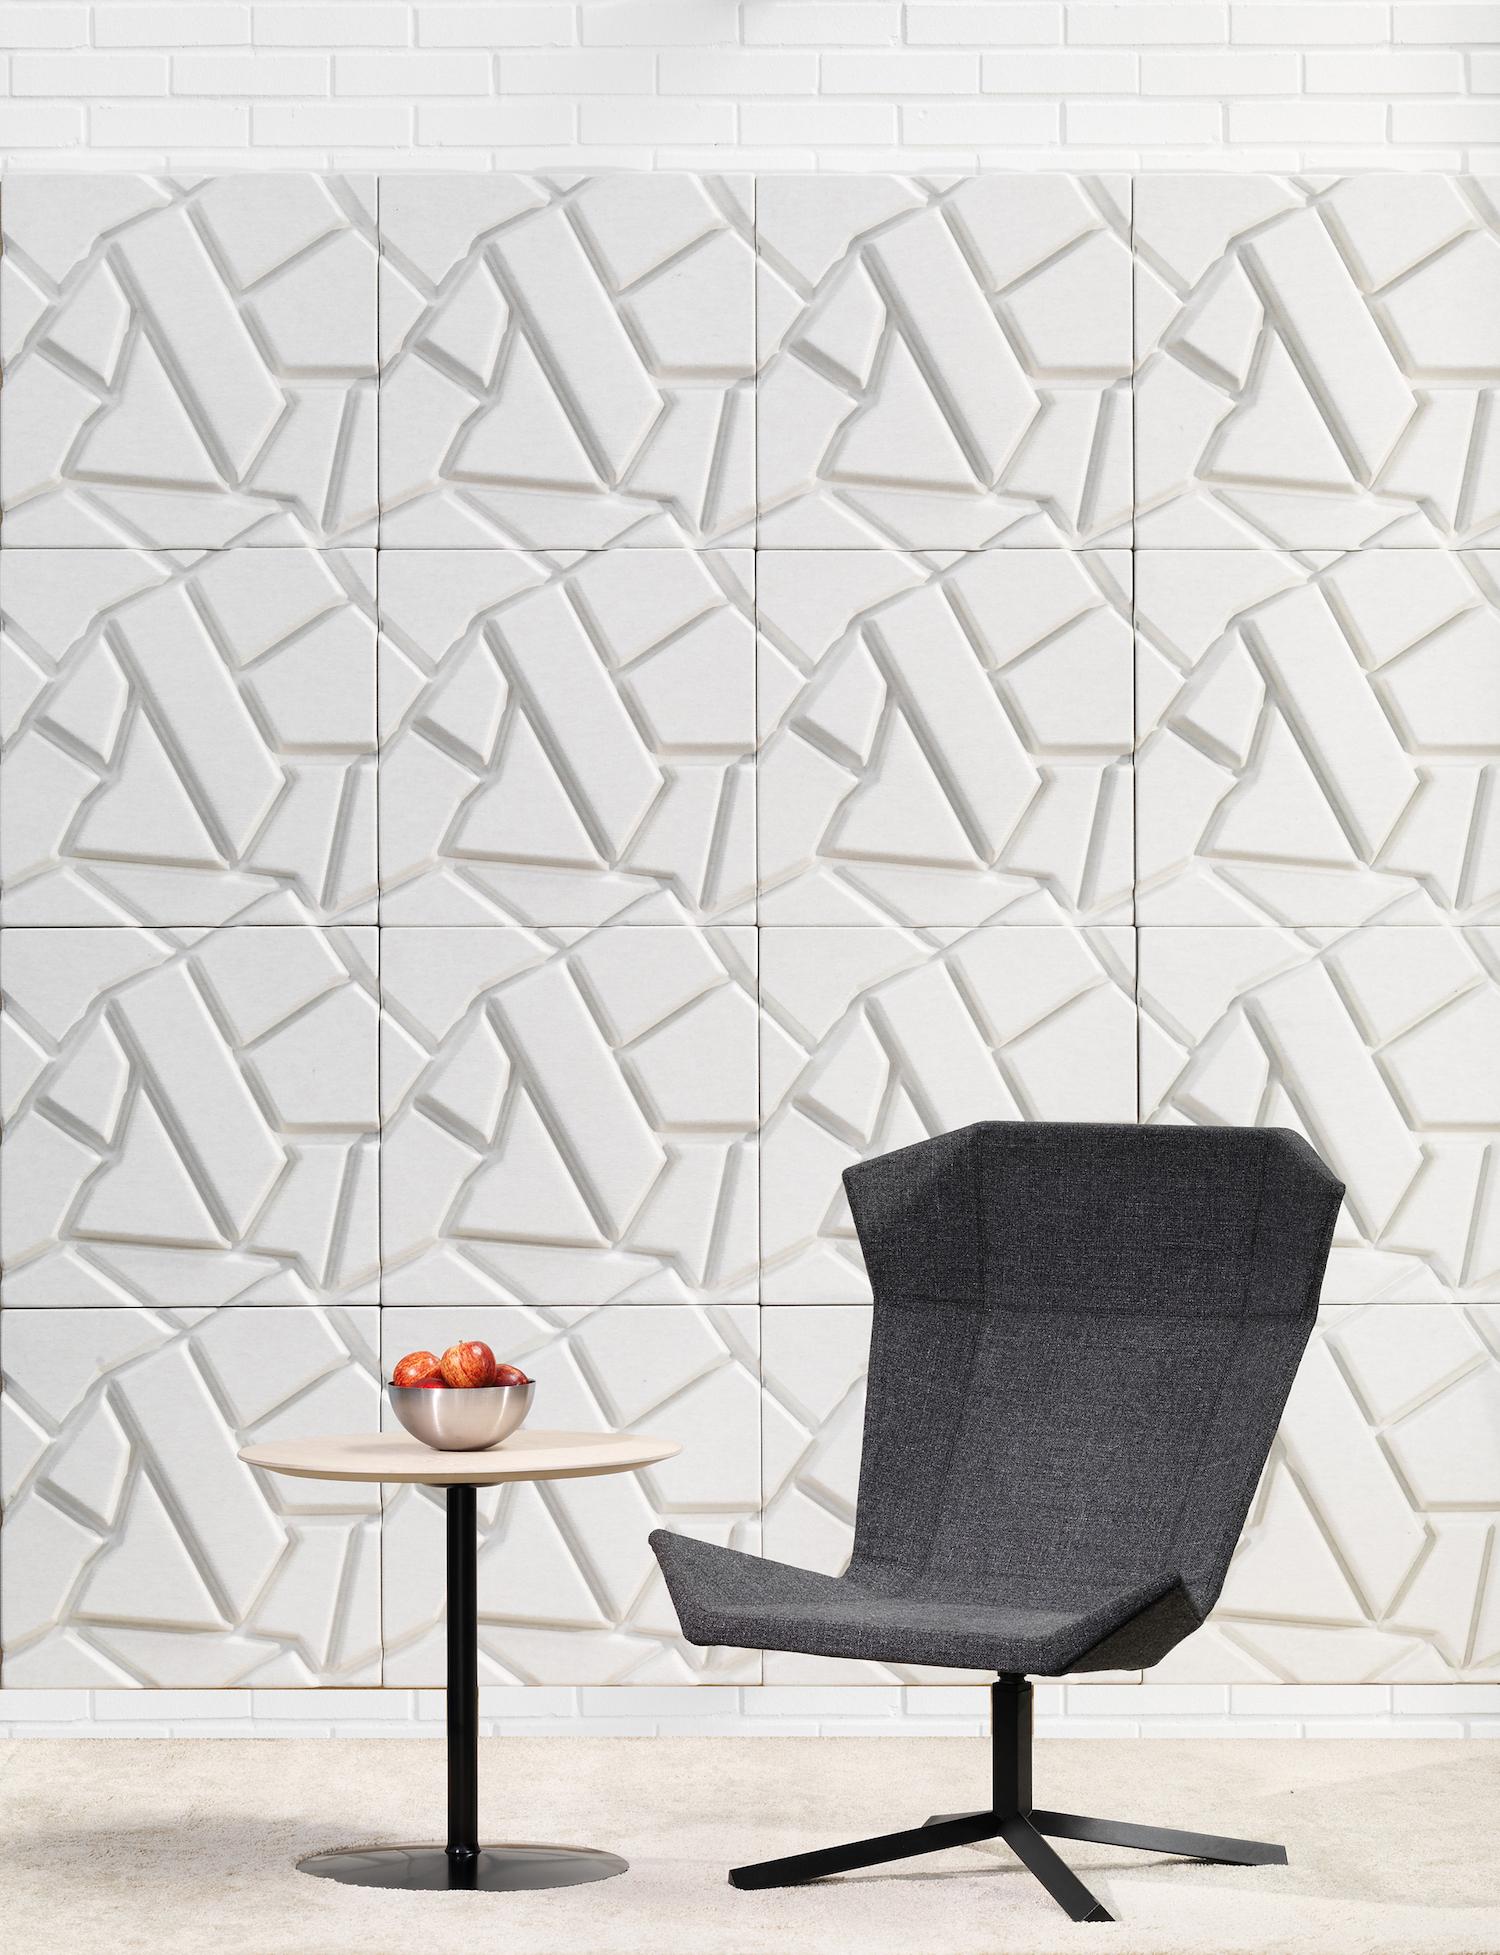 Wandabsorber Johanson Design «Cropfield» in weiss (off-white)